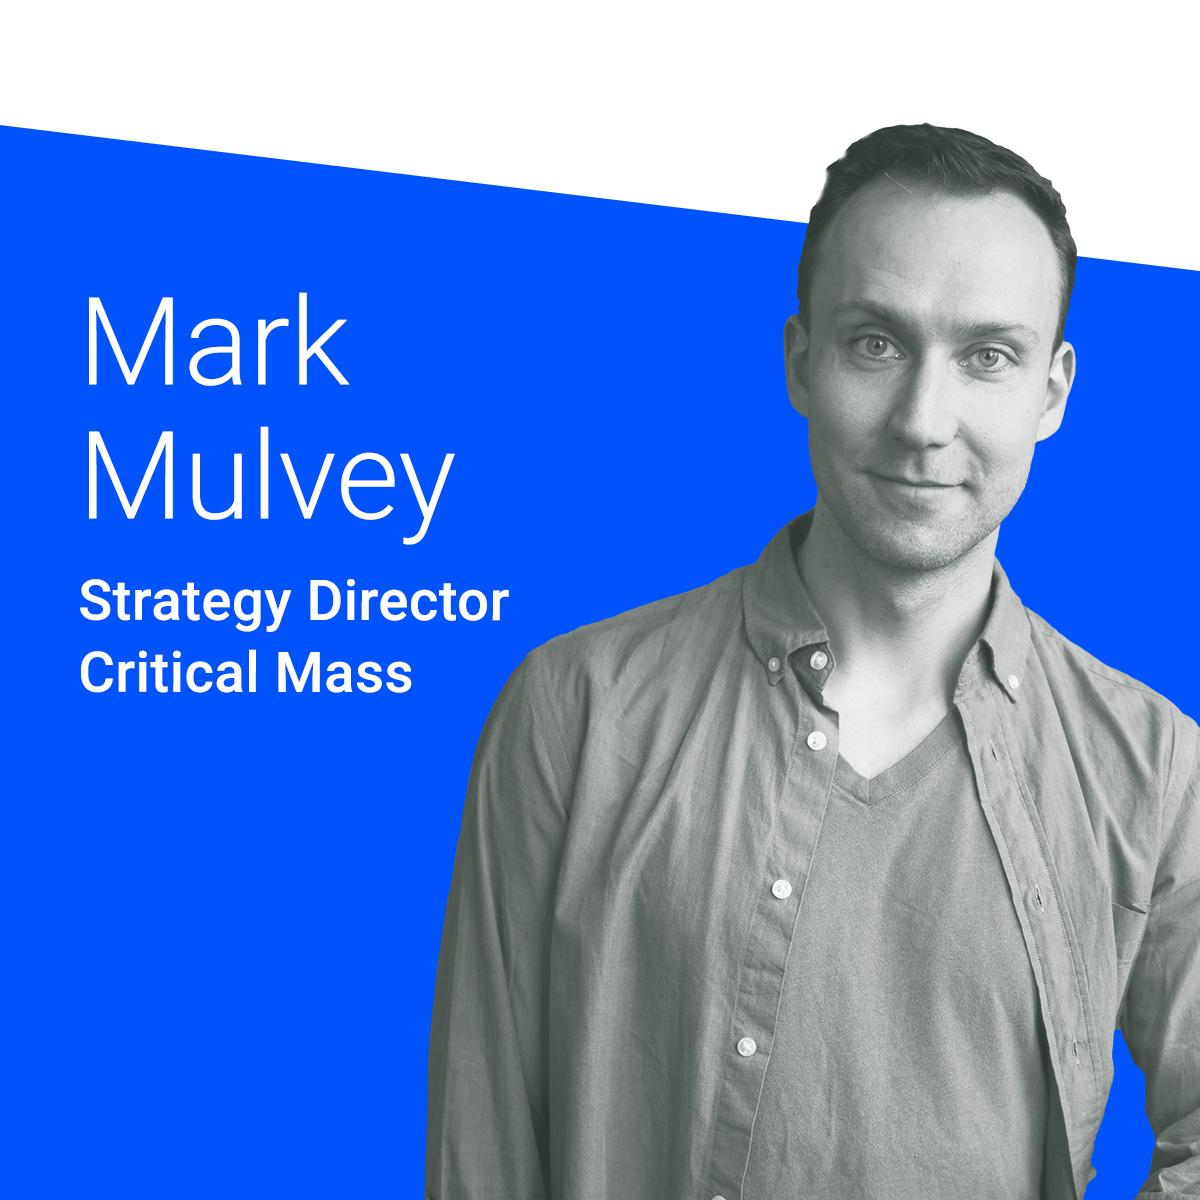 Mulvey_Stratfest-featuredSpeaker.jpg